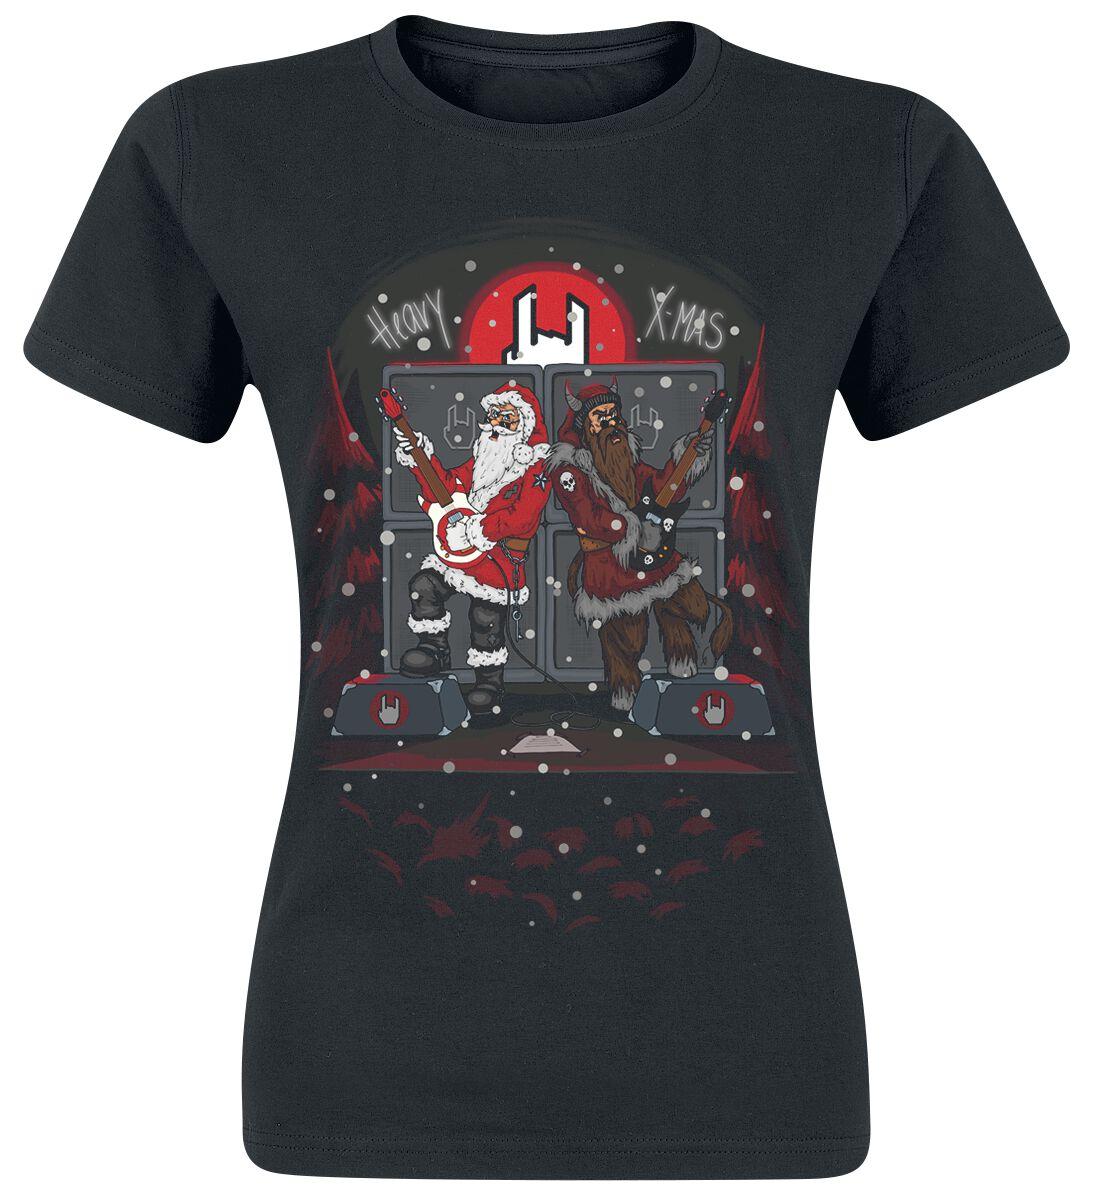 Fun Shirts - Koszulki - Koszulka damska EMP EMP Heavy X-Mas Koszulka damska czarny - 368224